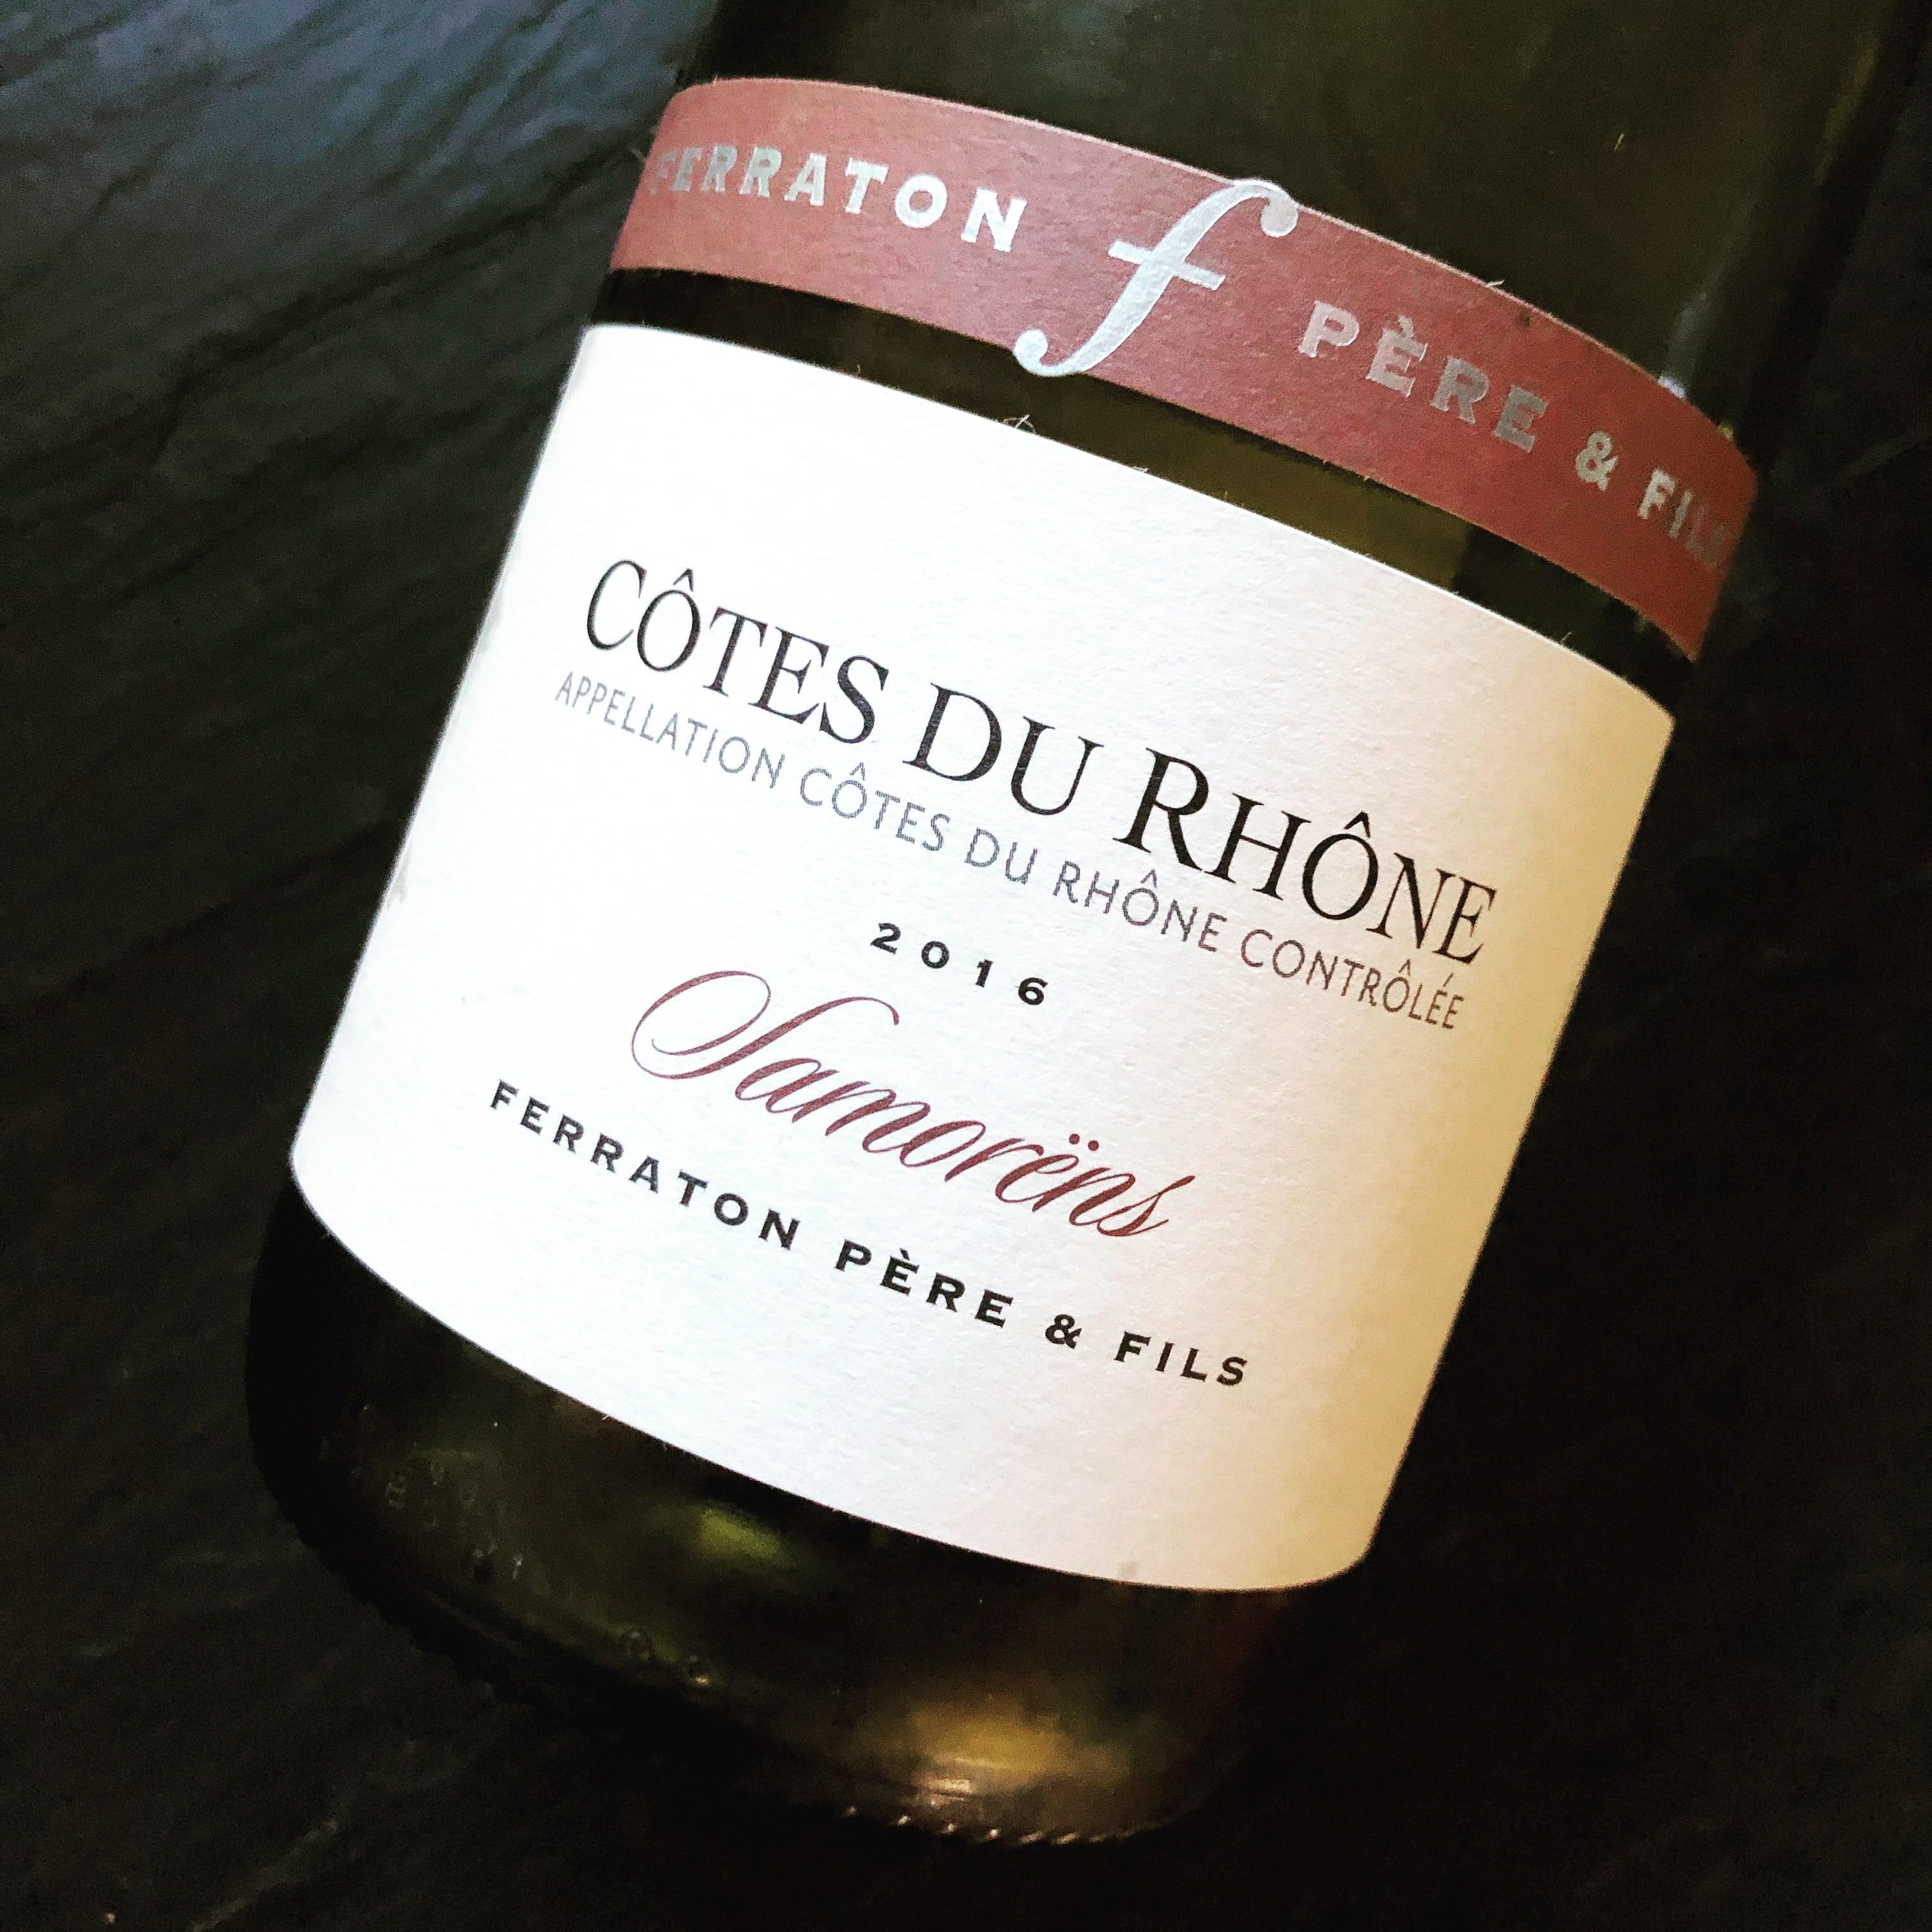 Ferraton Pere & Fils Côtes du Rhône Samorëns Blanc 2016